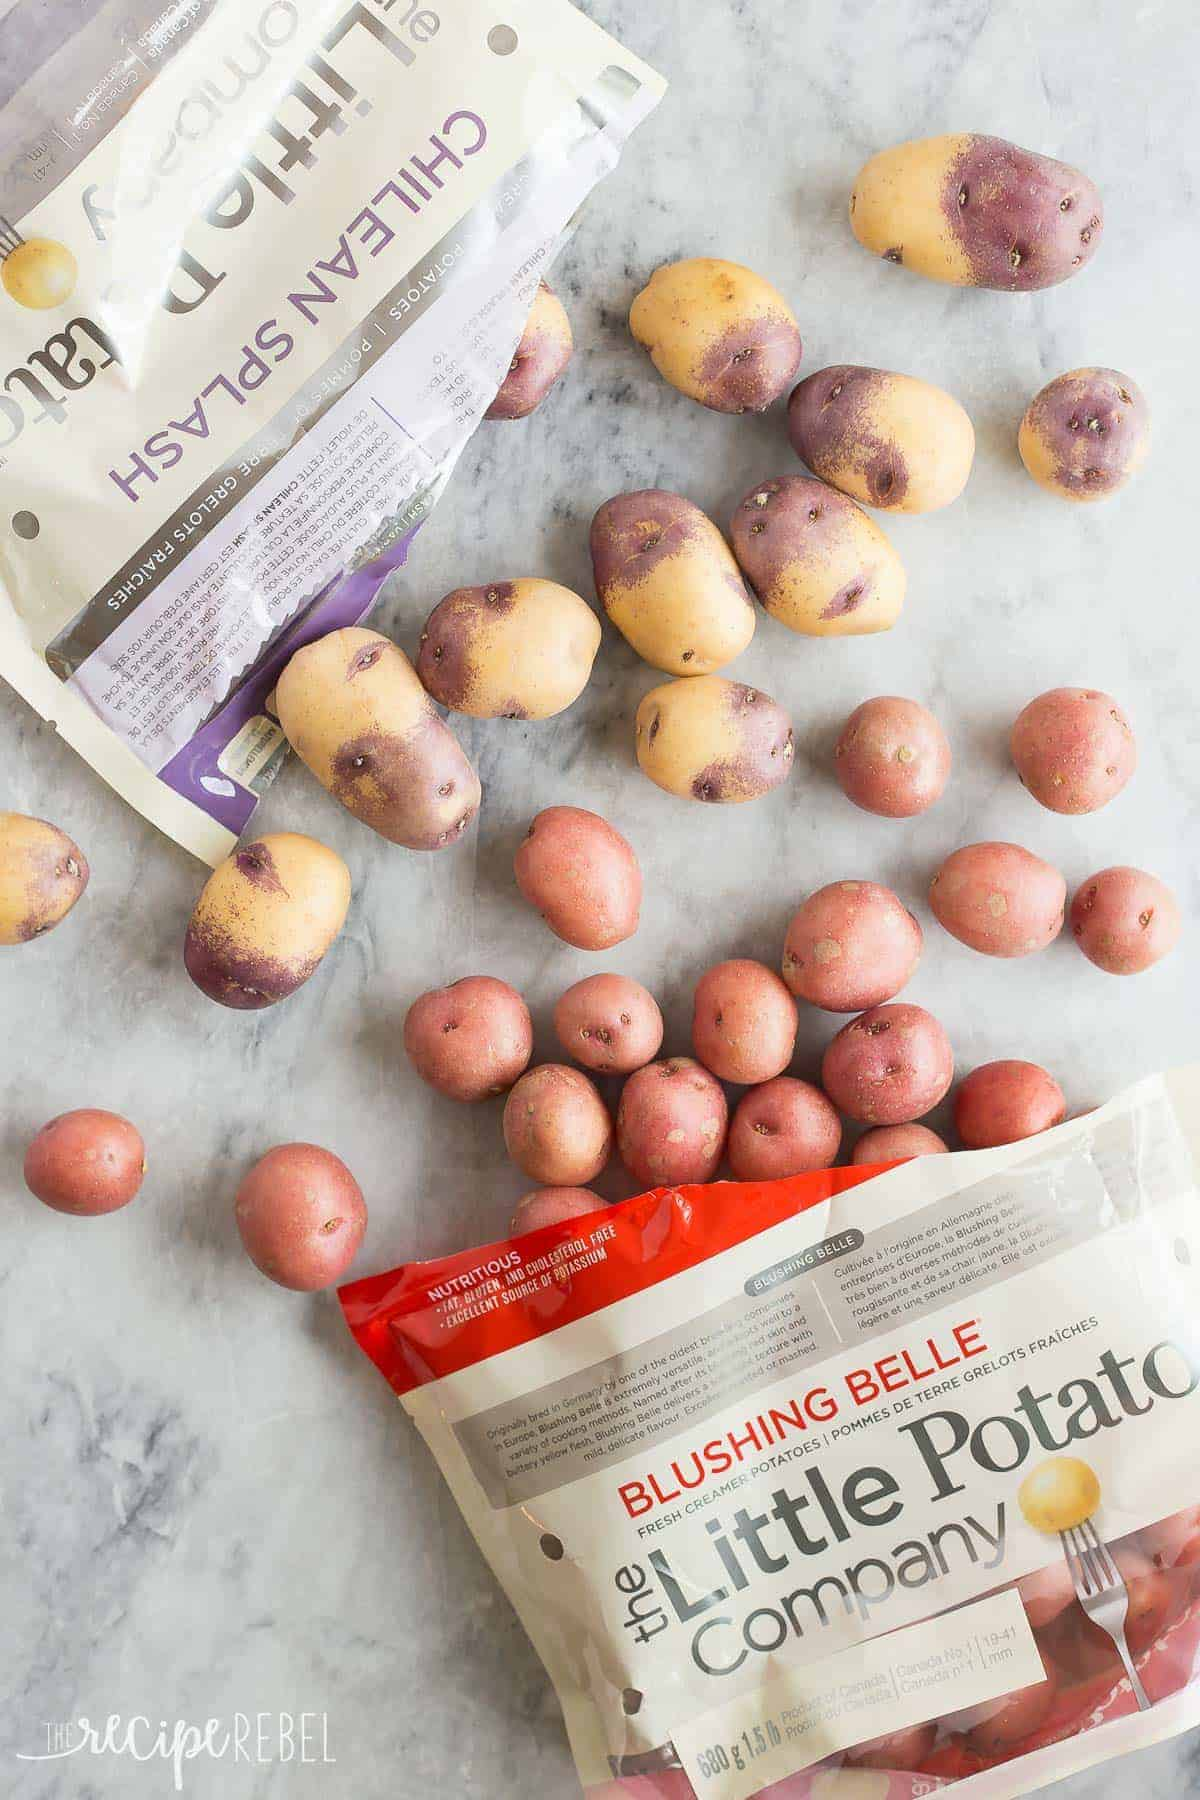 Little-Potatoes-www.thereciperebel.com (1 of 1)